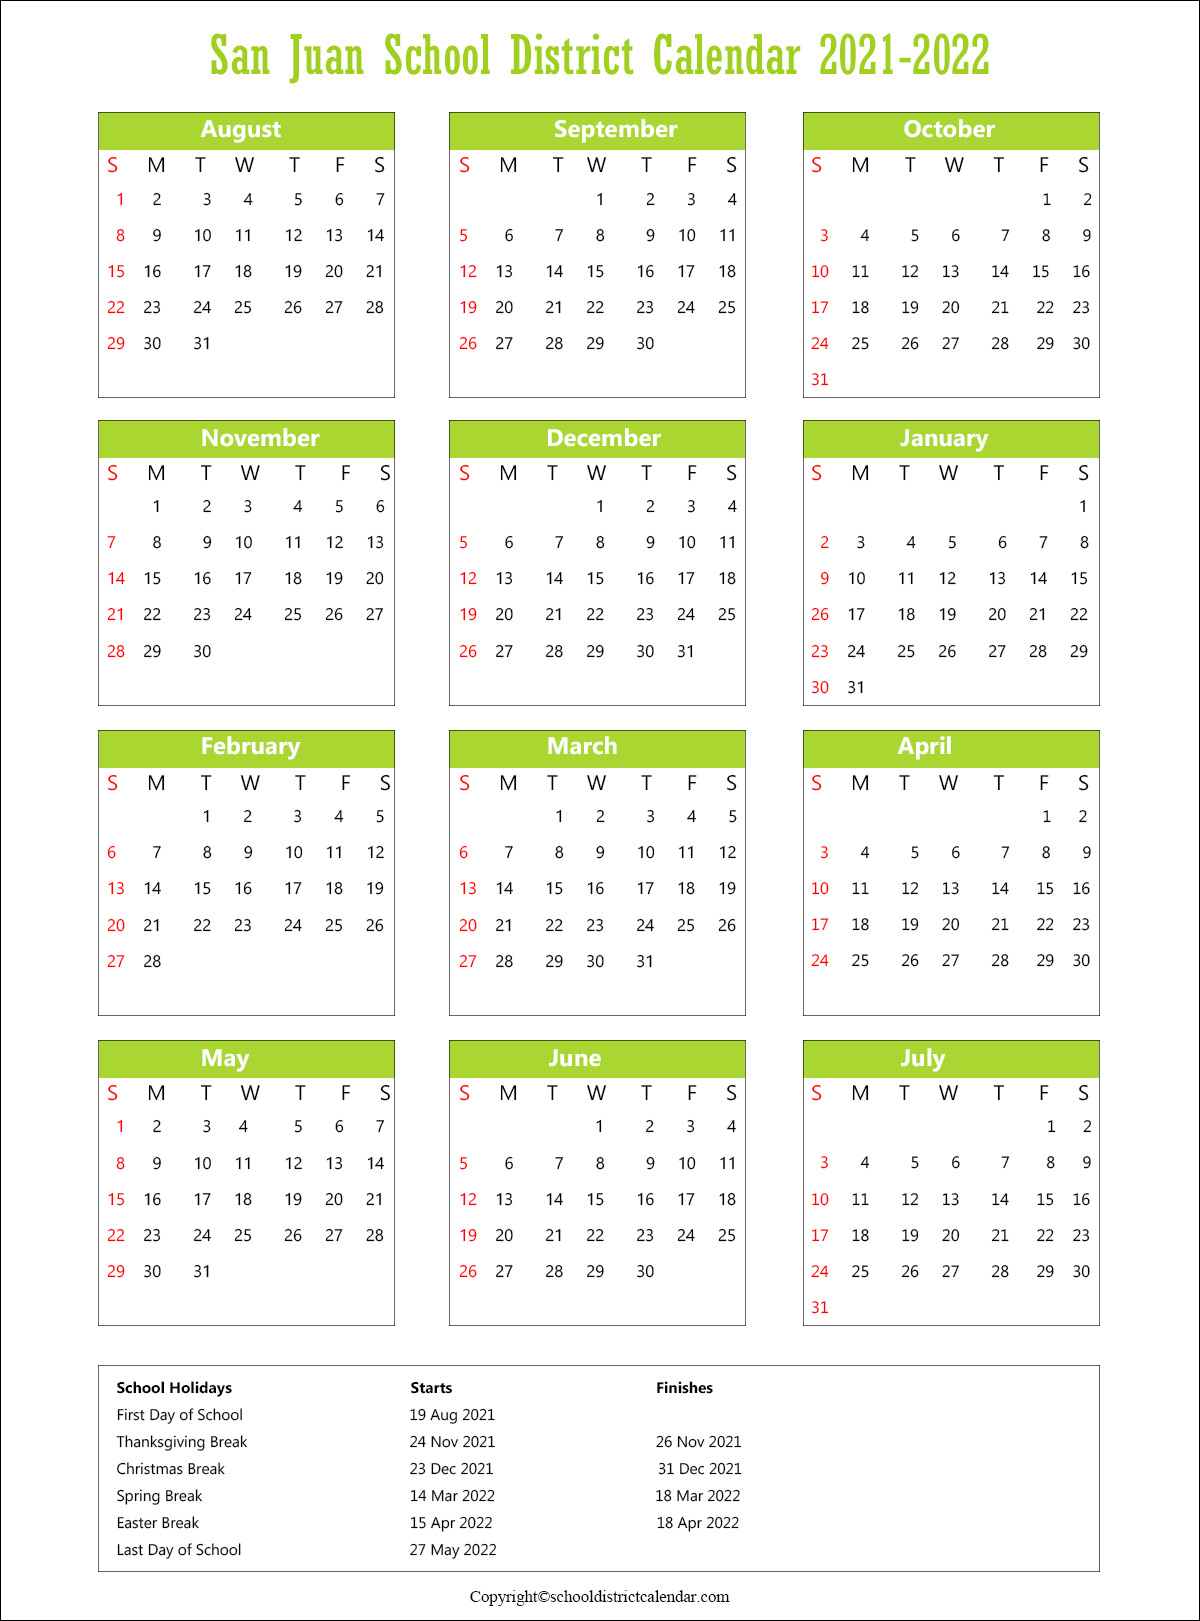 San Juan Unified School District, California Calendar Holidays 2021